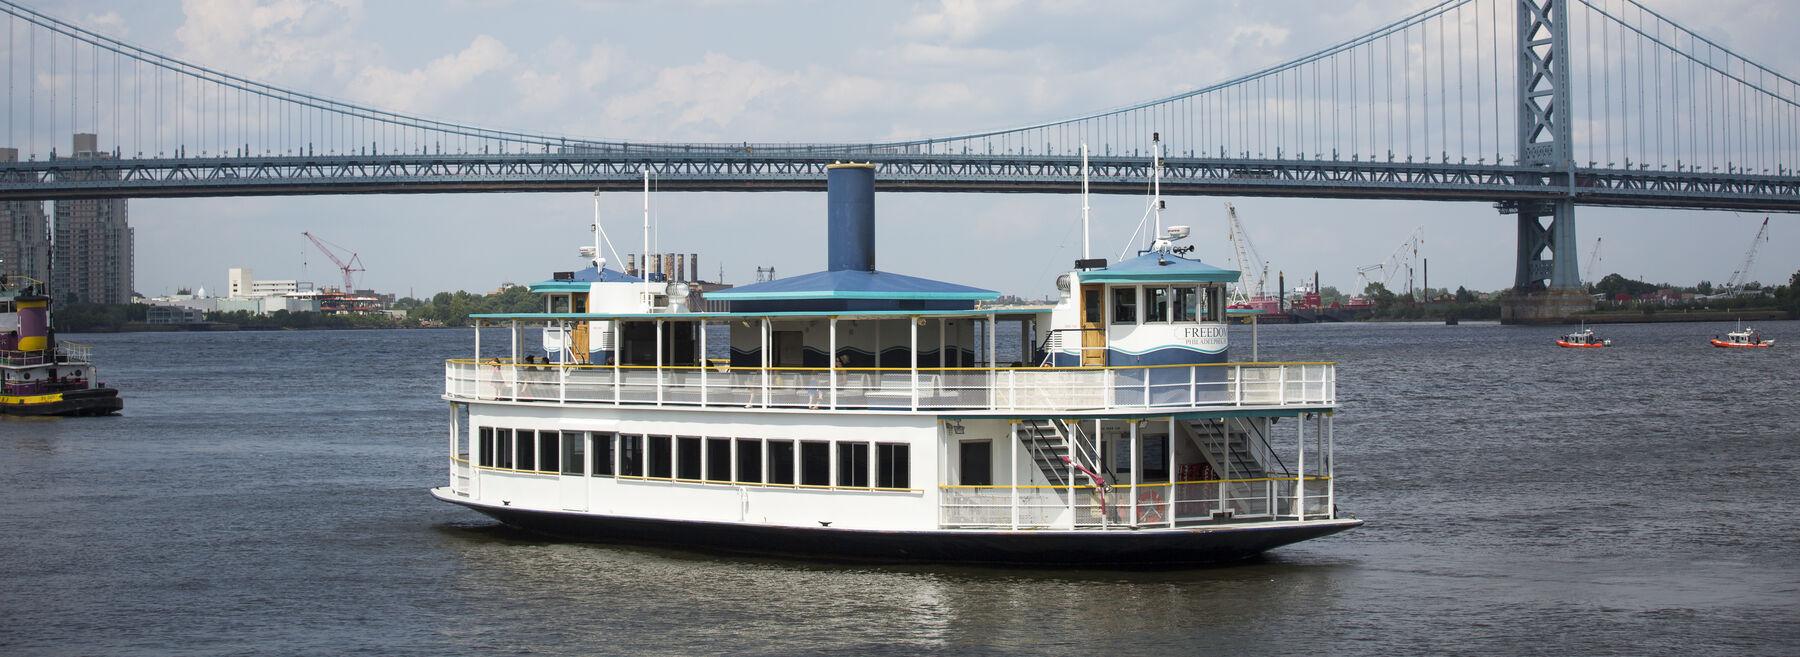 RiverLink Ferry